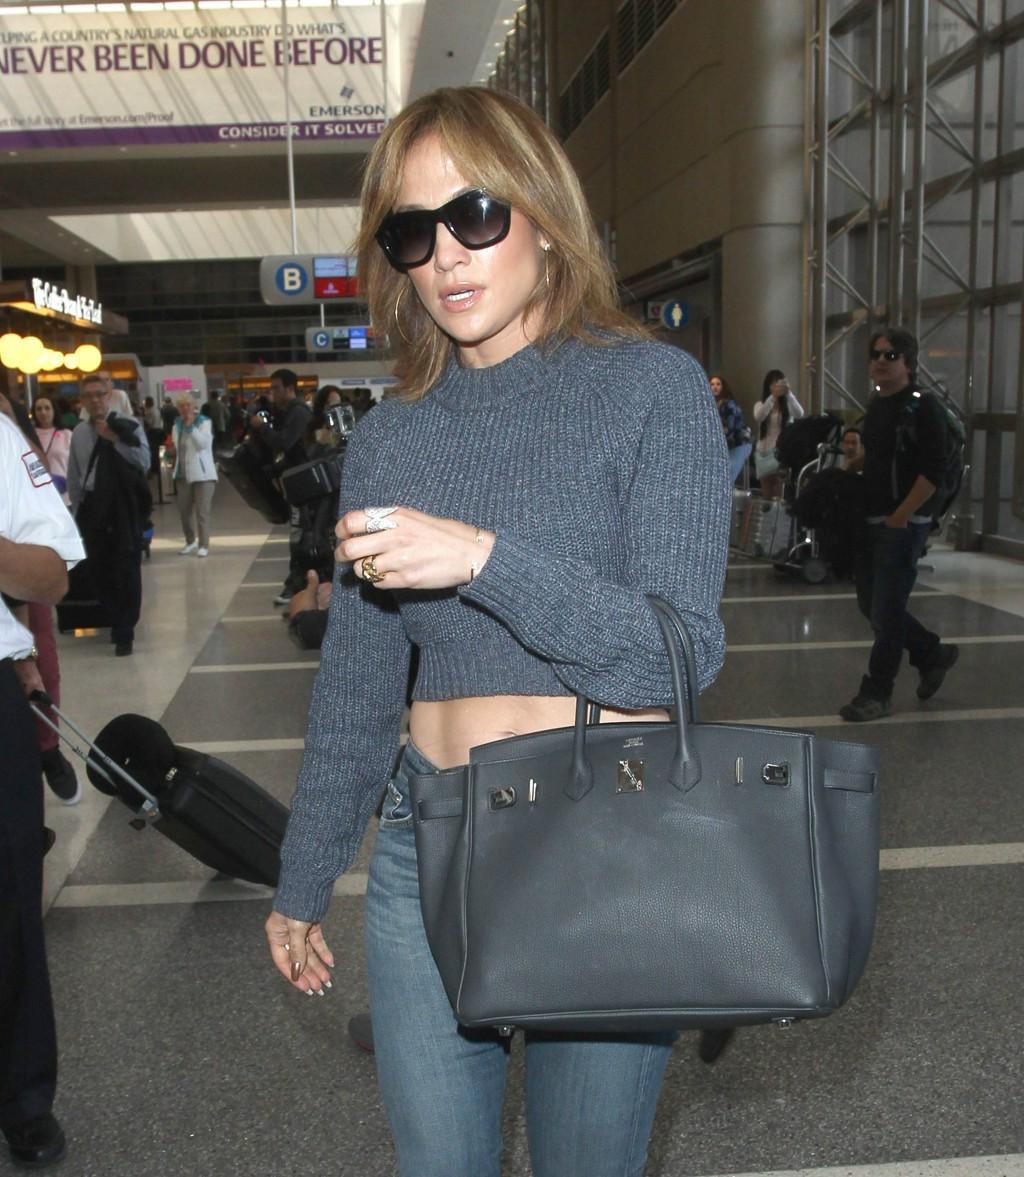 Clown Confetti Bombs Jennifer Lopez at the Airport Because Clowns Aren't Terrifying Enough http://t.co/A2Q35qH6PI http://t.co/pbw49ezBXx